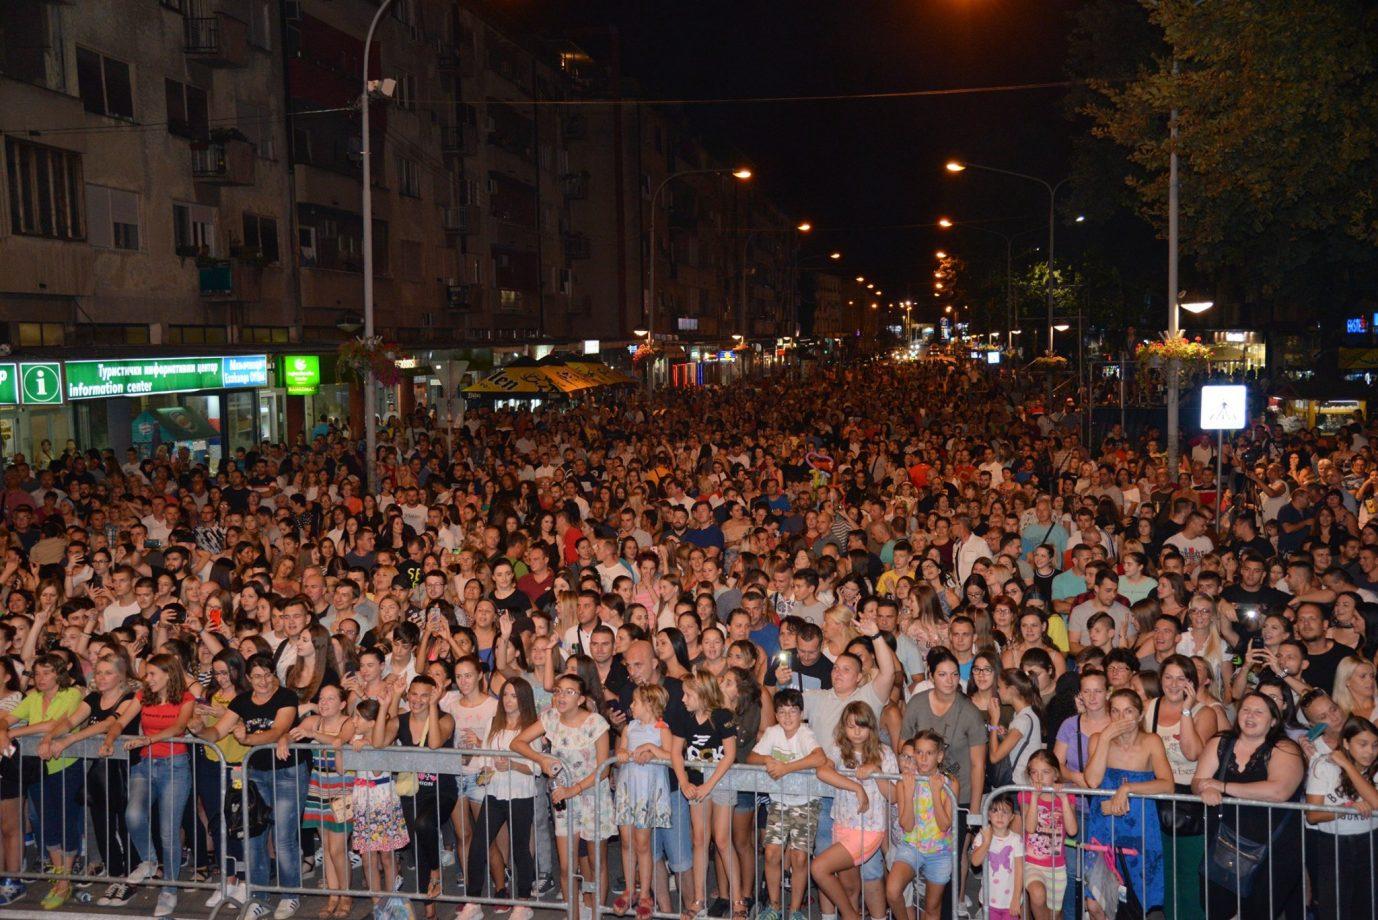 Večeras na trgu Renato Henc i Crvena Jabuka, juče nastupili Boris  Petrović i Lexington bend FOTO 22678